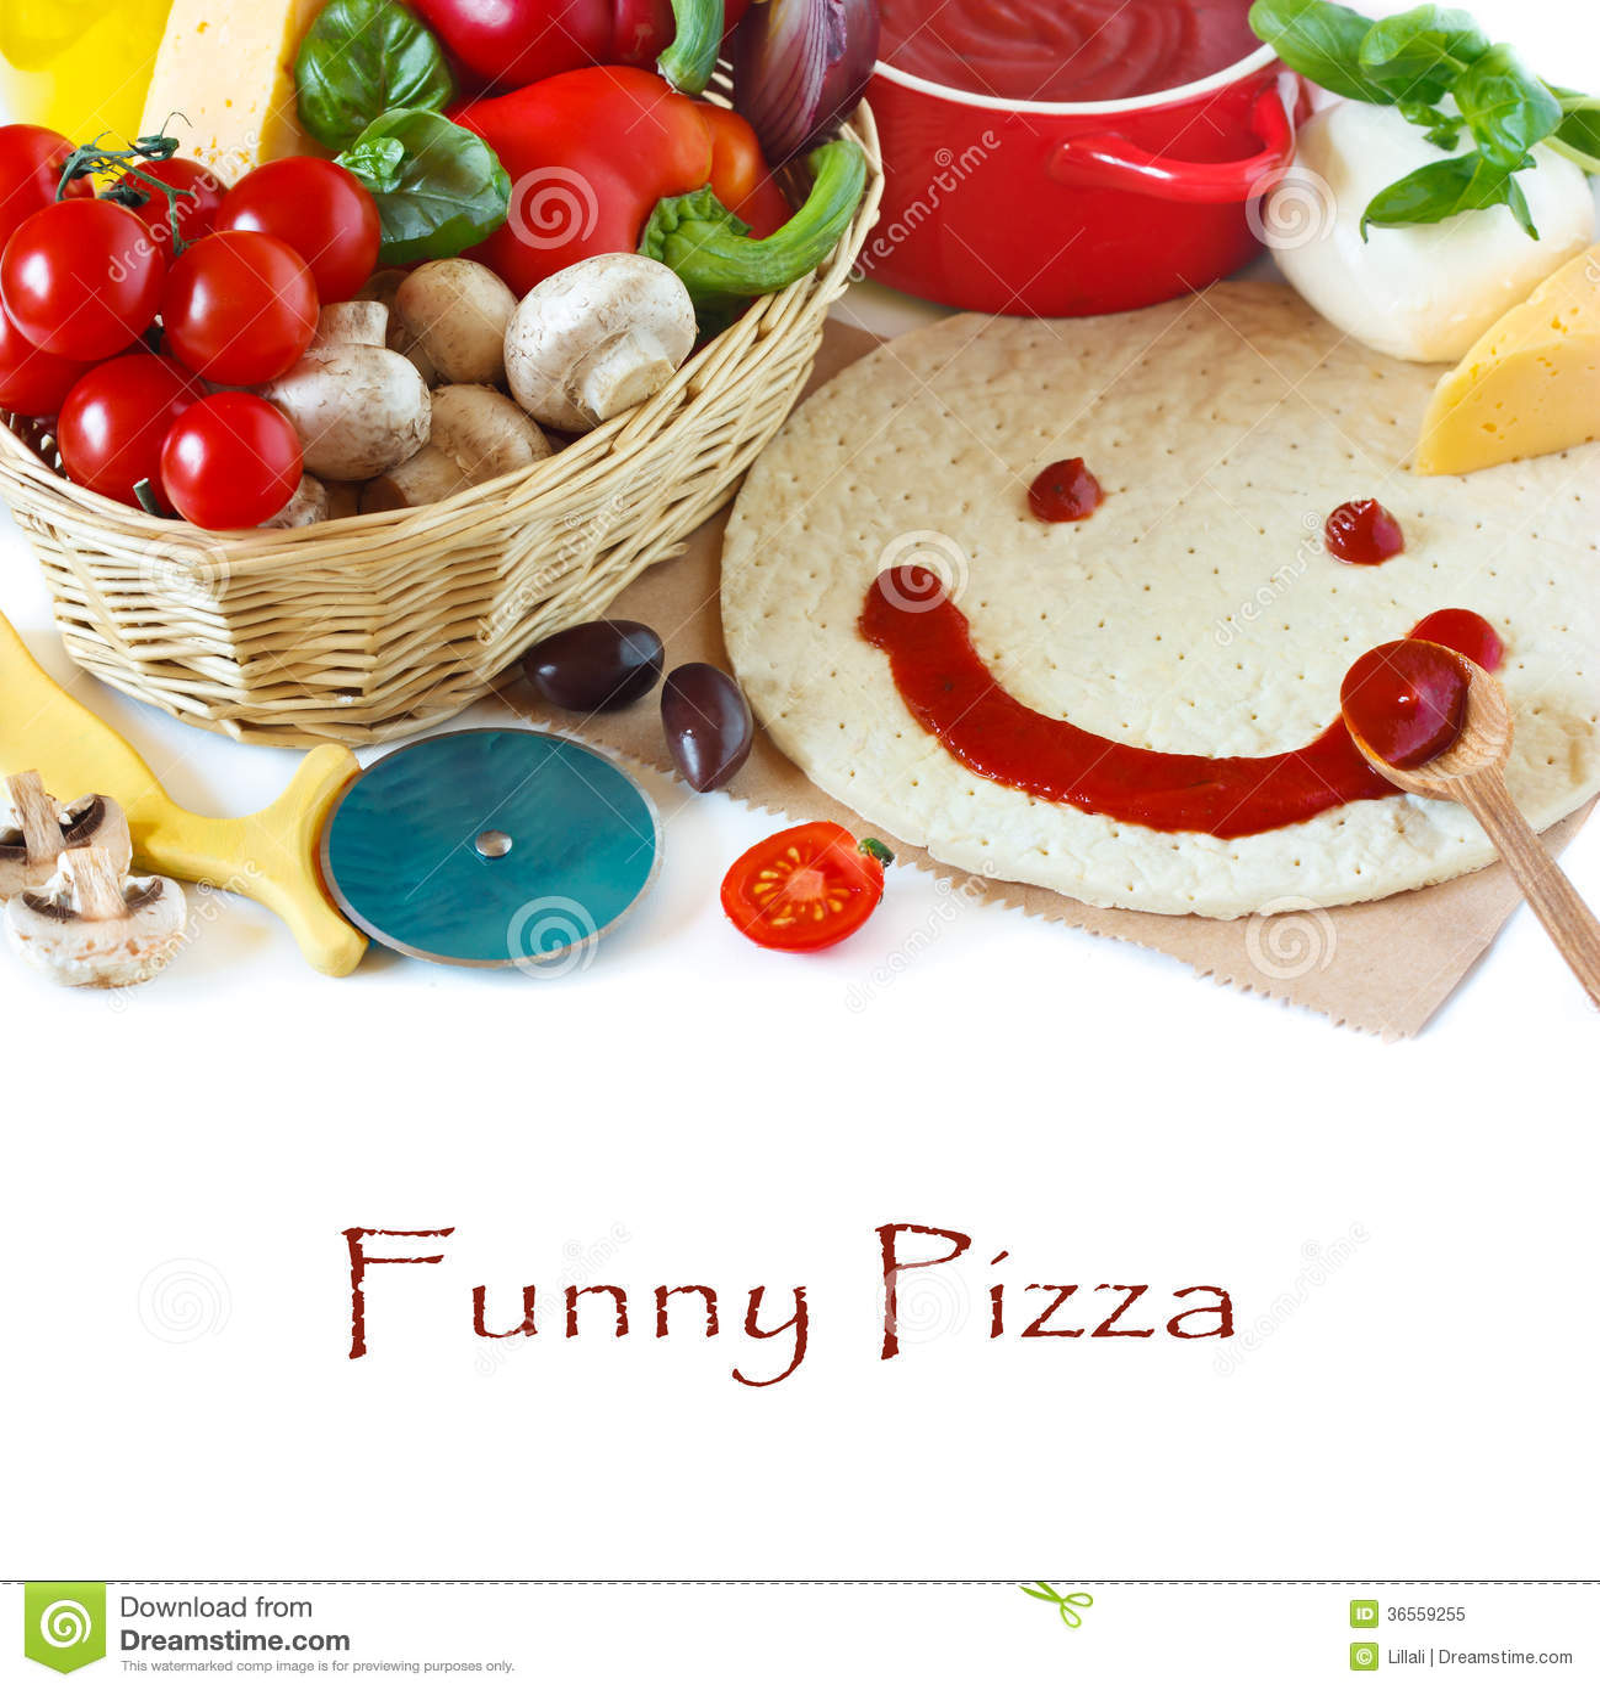 Funny pizza.